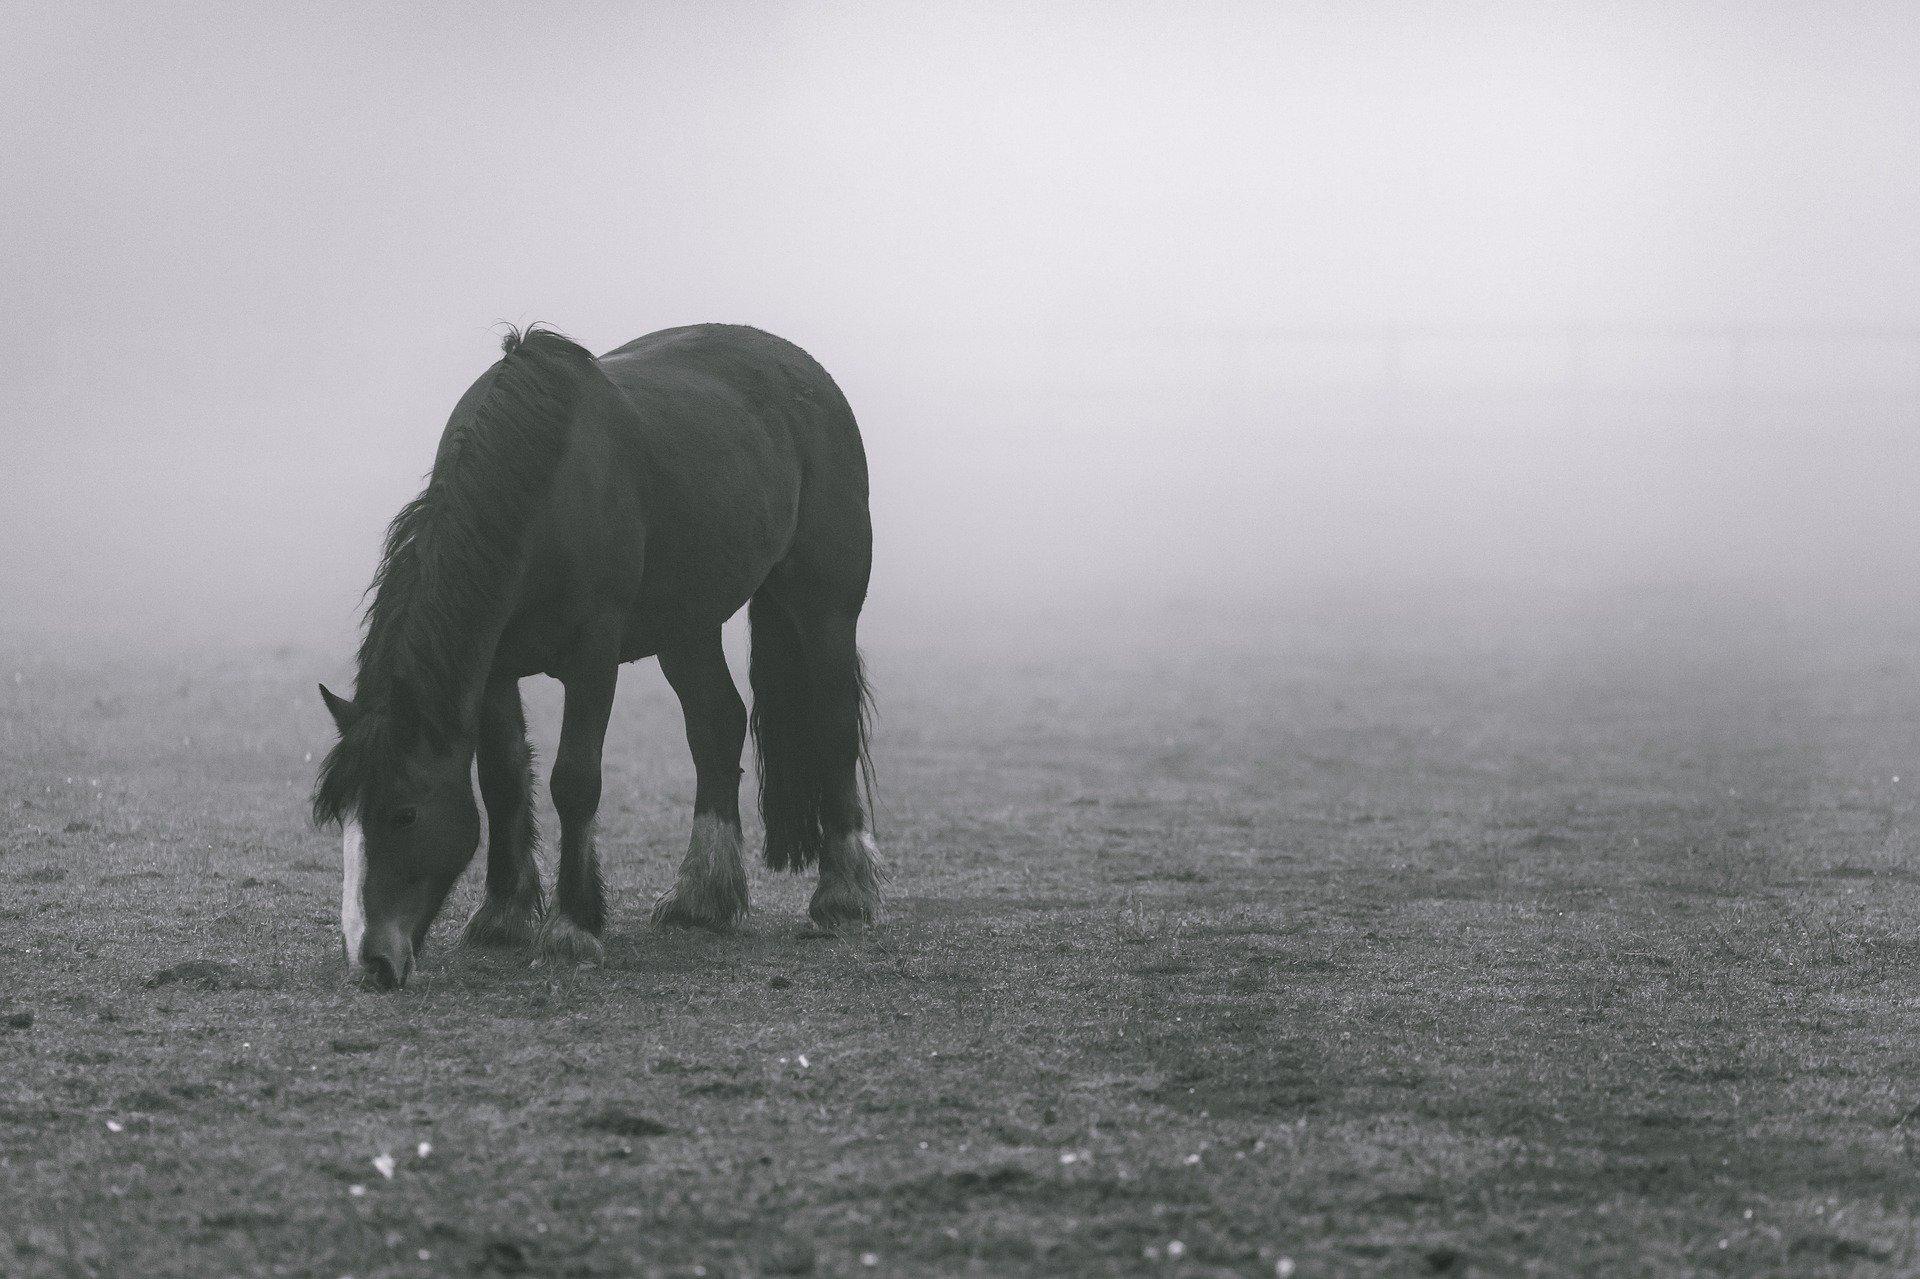 Pferd mit Auto nachgezogen: Paar wegen Tierquälerei angezeigt